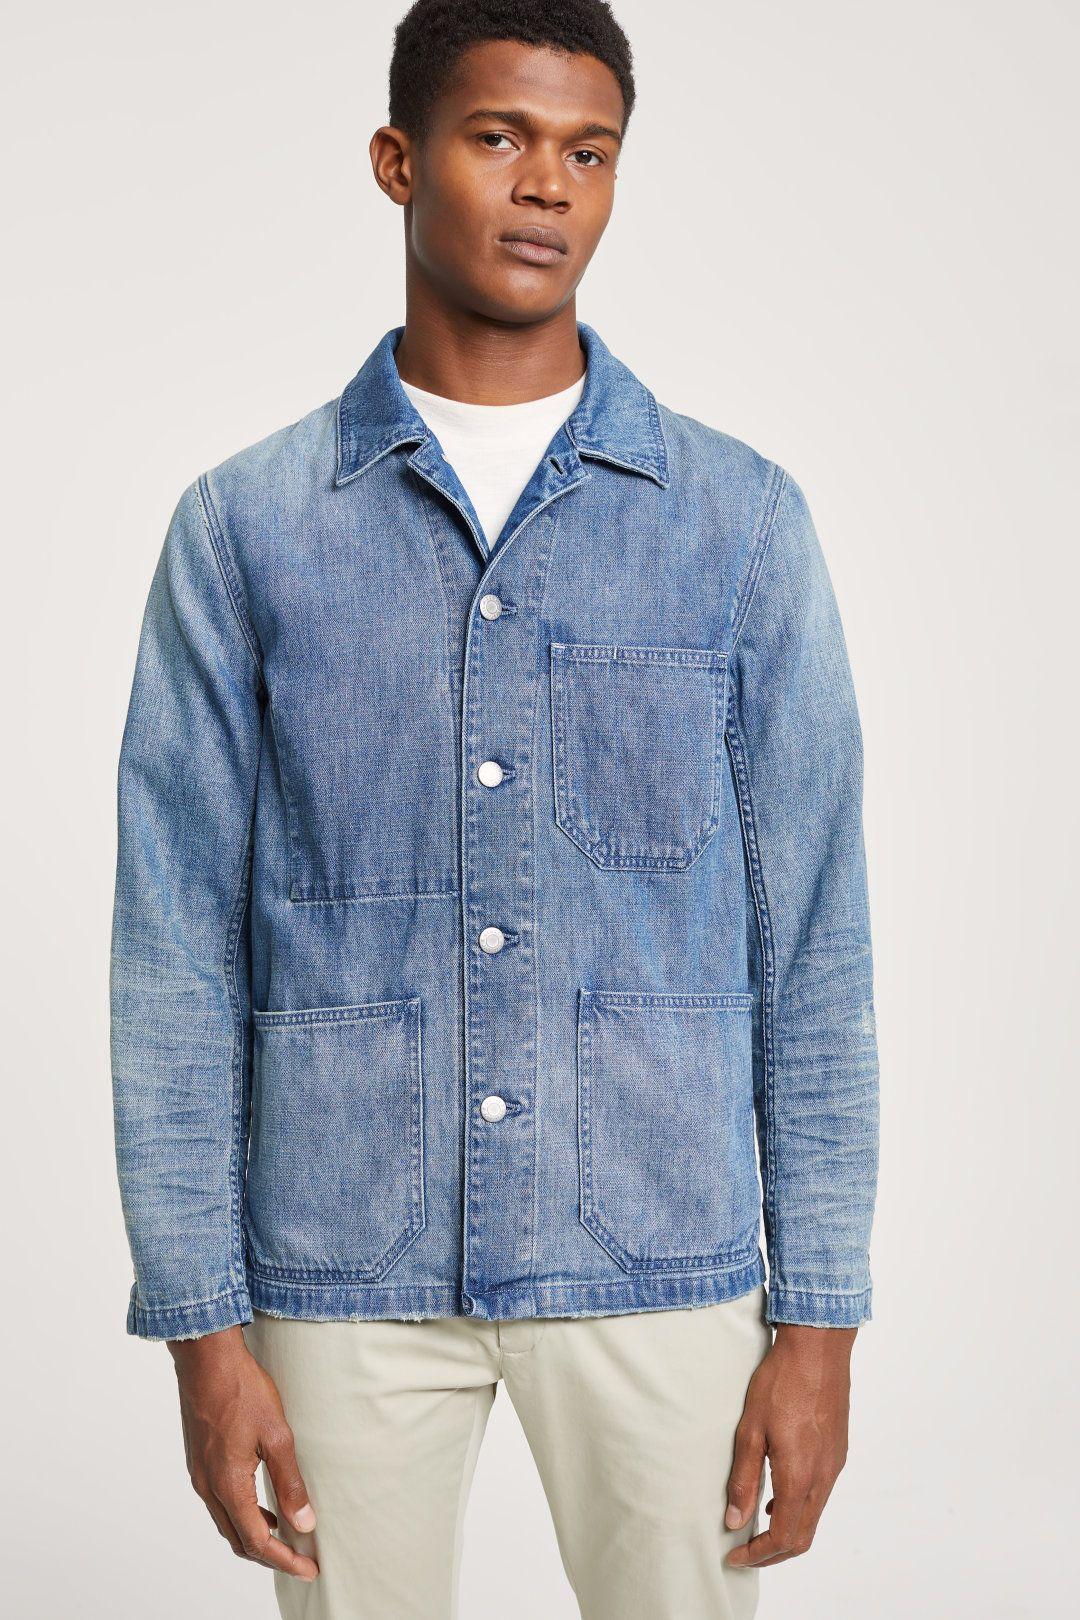 Worker Denim Jacket Closed Denim Jacket Men Casual Outerwear Mens Outfits [ 1620 x 1080 Pixel ]